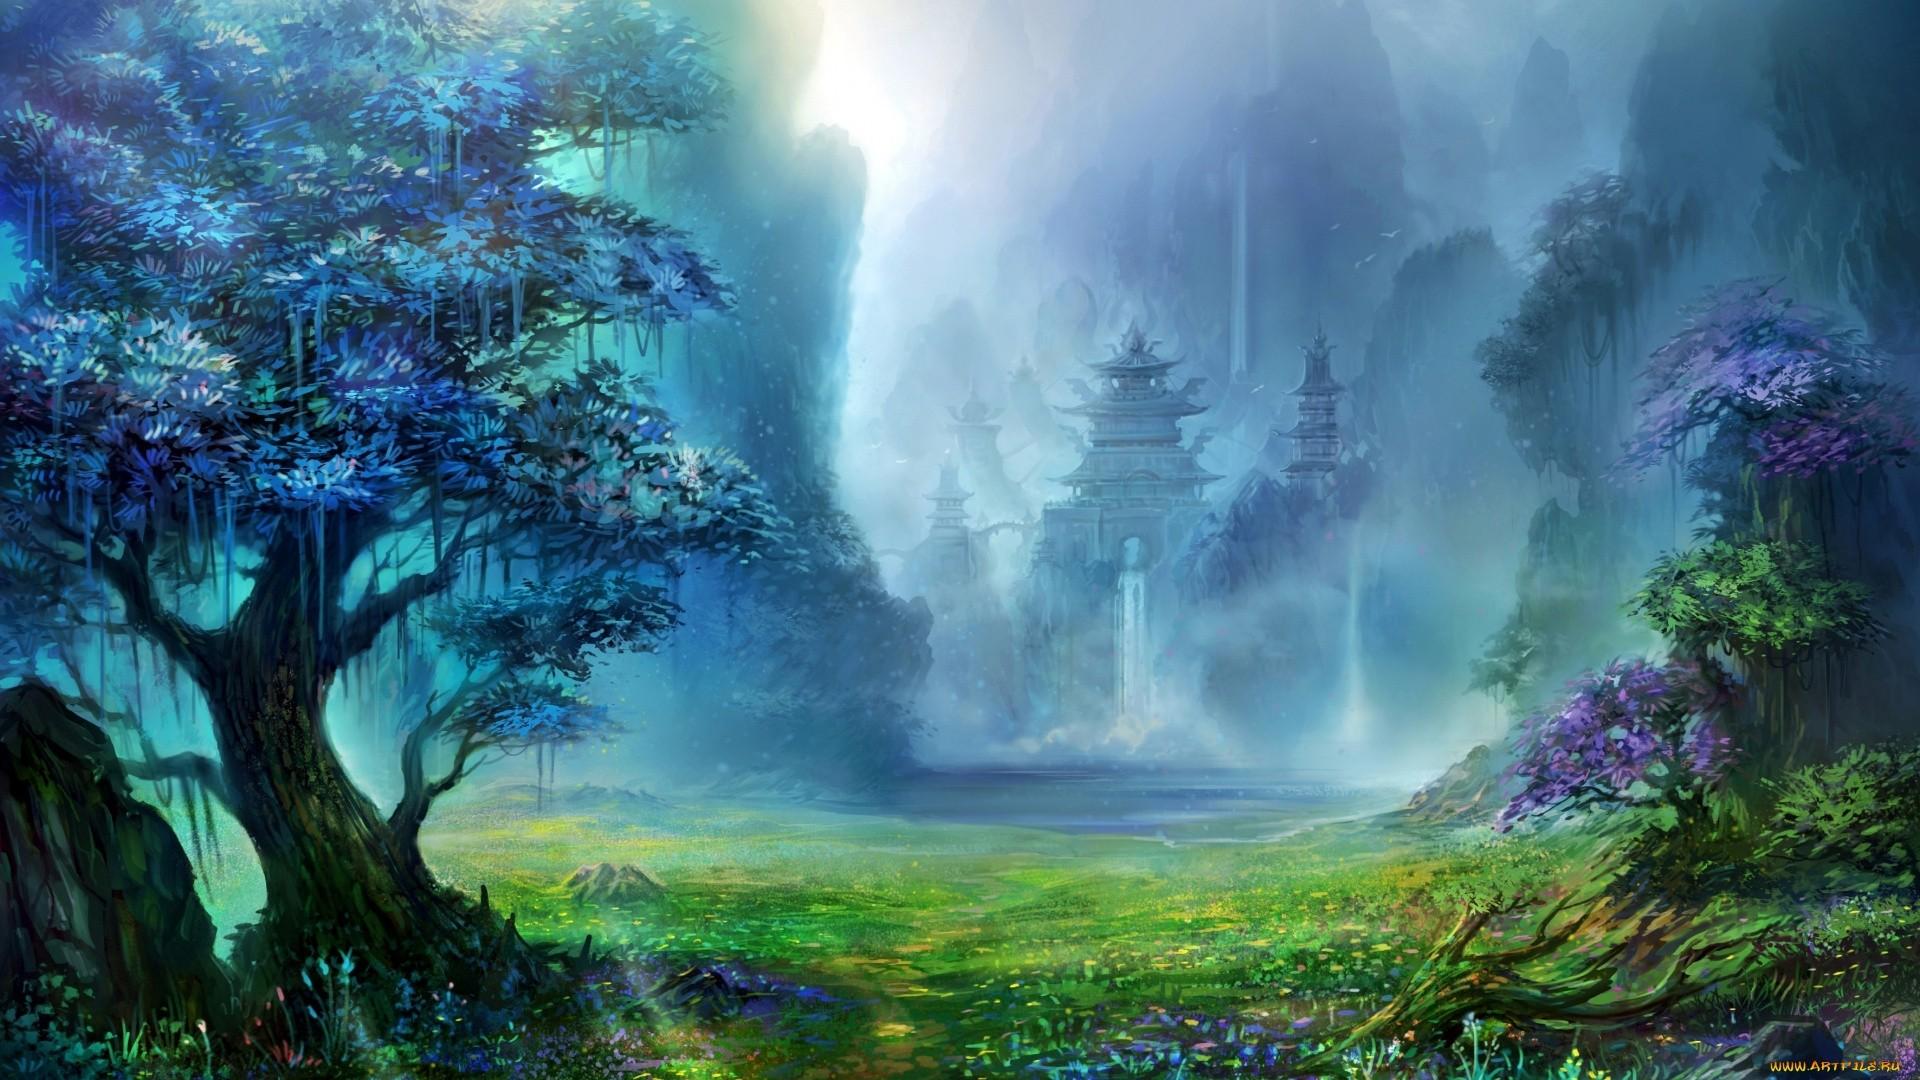 Magic Desktop wallpaper